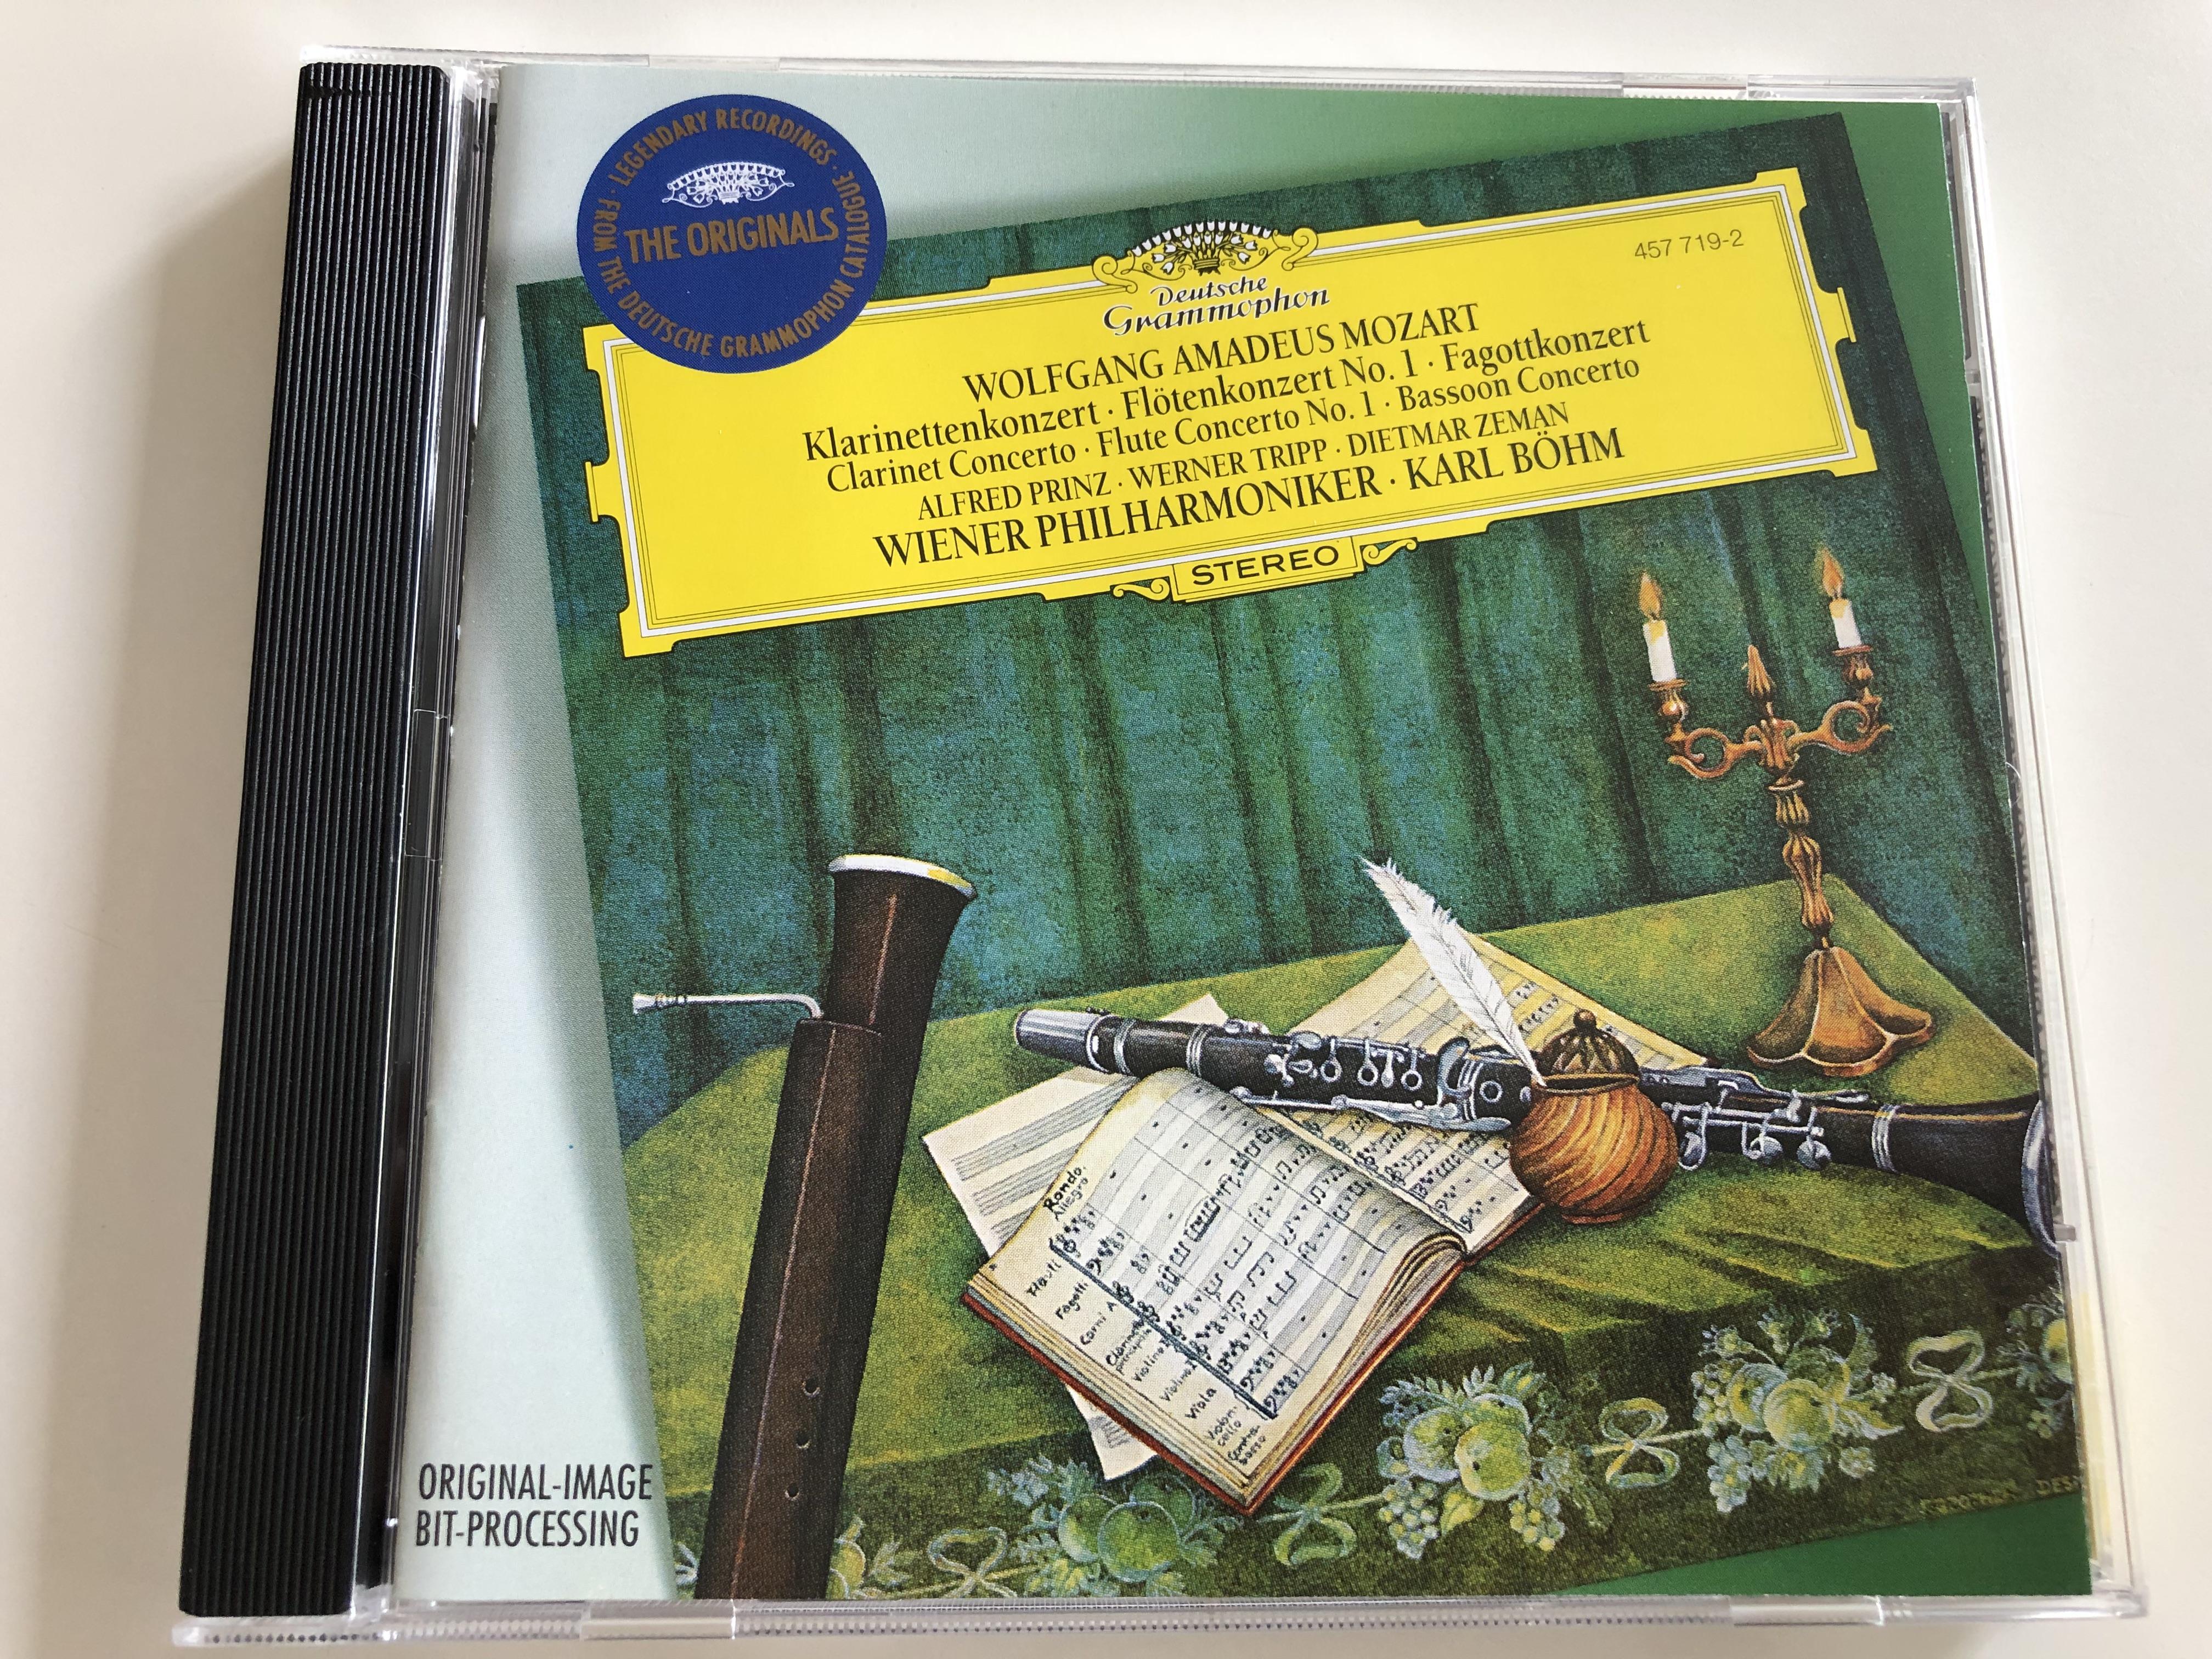 wolfgang-amadeus-mozart-klarinettenkonzert-clarinet-concerto-alfred-prinz-werner-tripp-dietmar-zeman-wiener-philharmoniker-conducted-by-karl-b-hm-audio-cd-457-719-2-1-.jpg